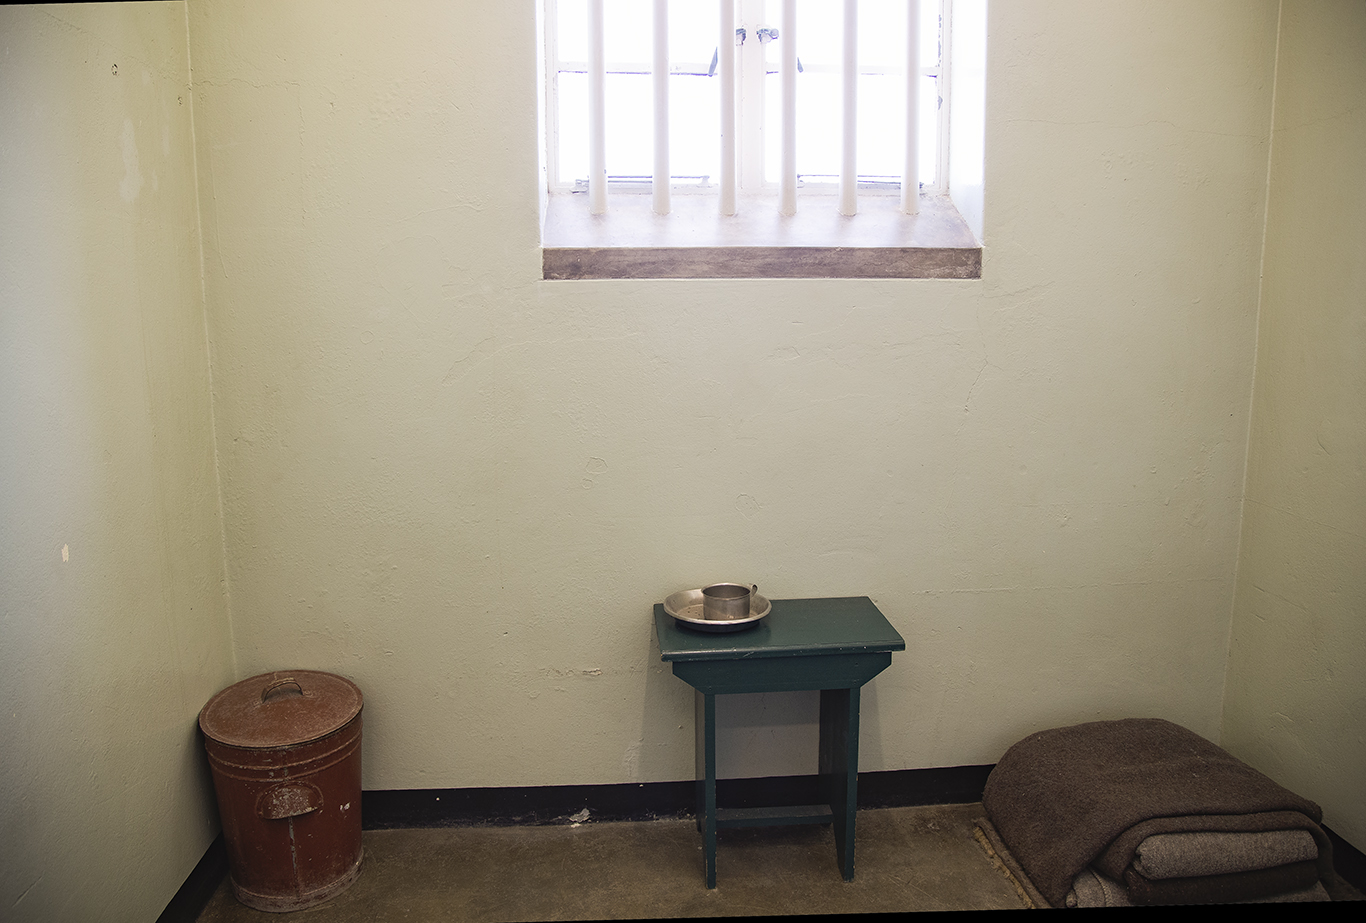 Nelson Madela's Cell, Robben Island